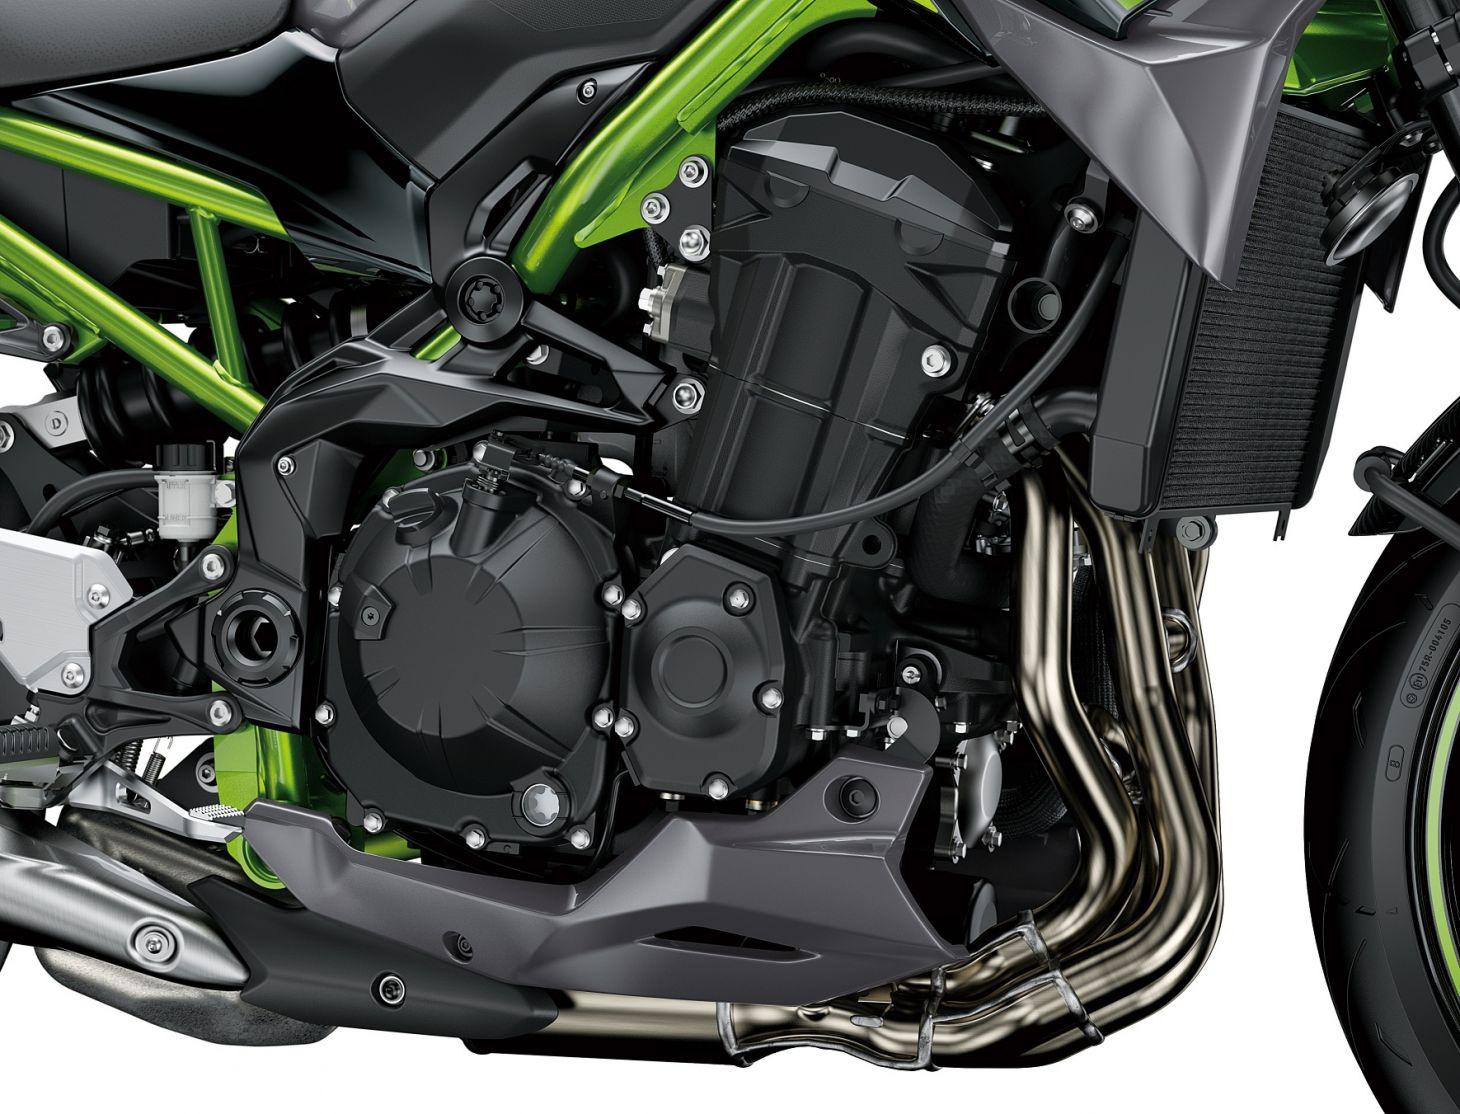 Kawasaki Z 900: motor de quatro cilindros